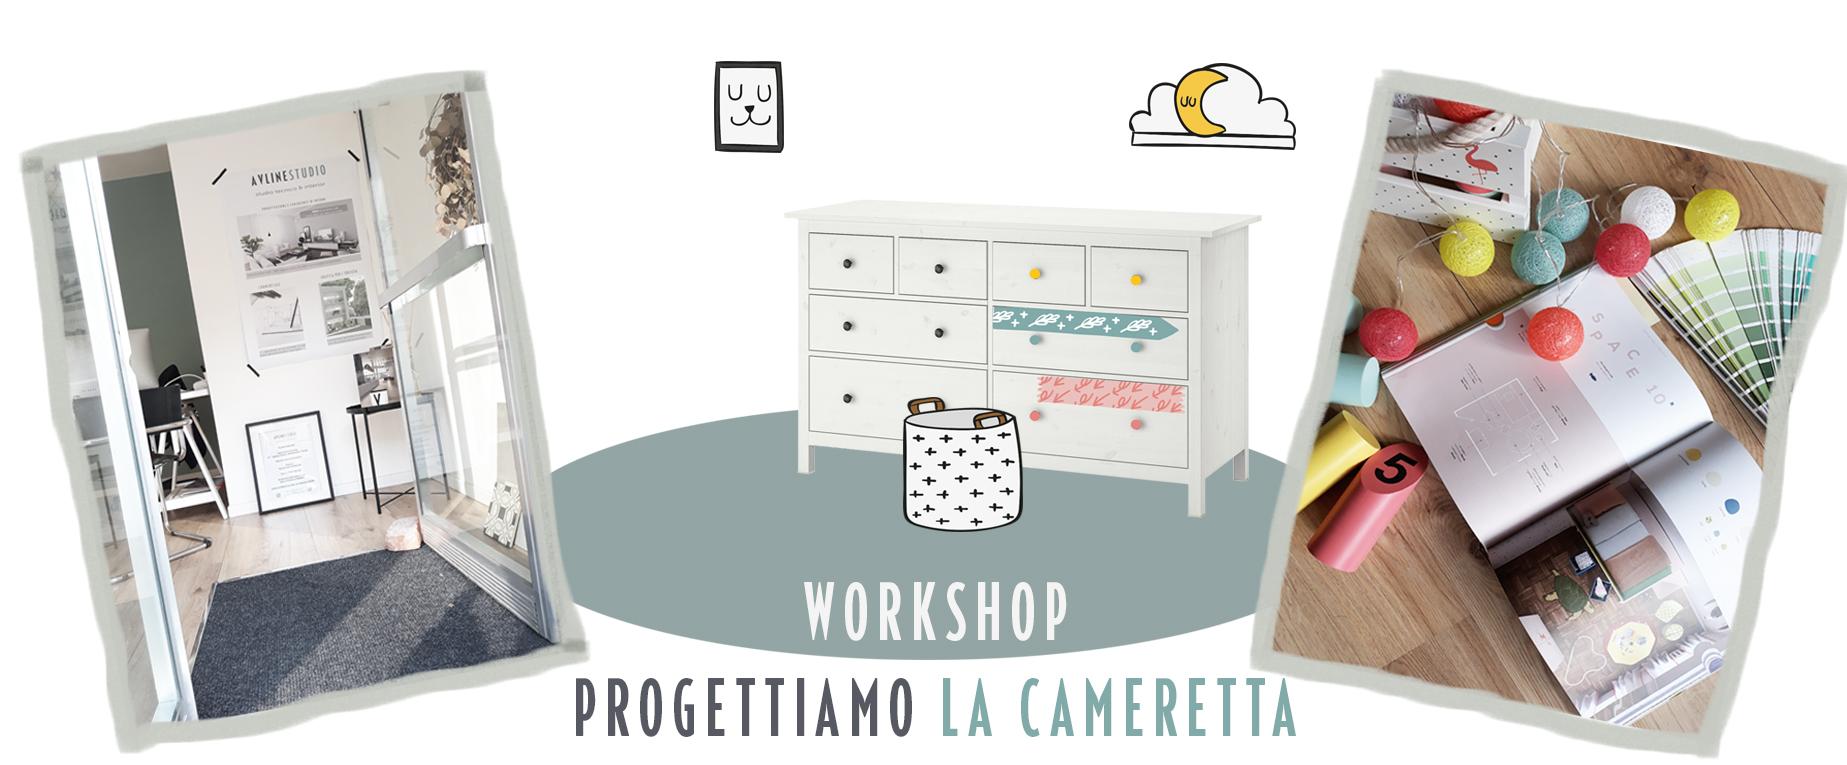 immagine sito workshop 2